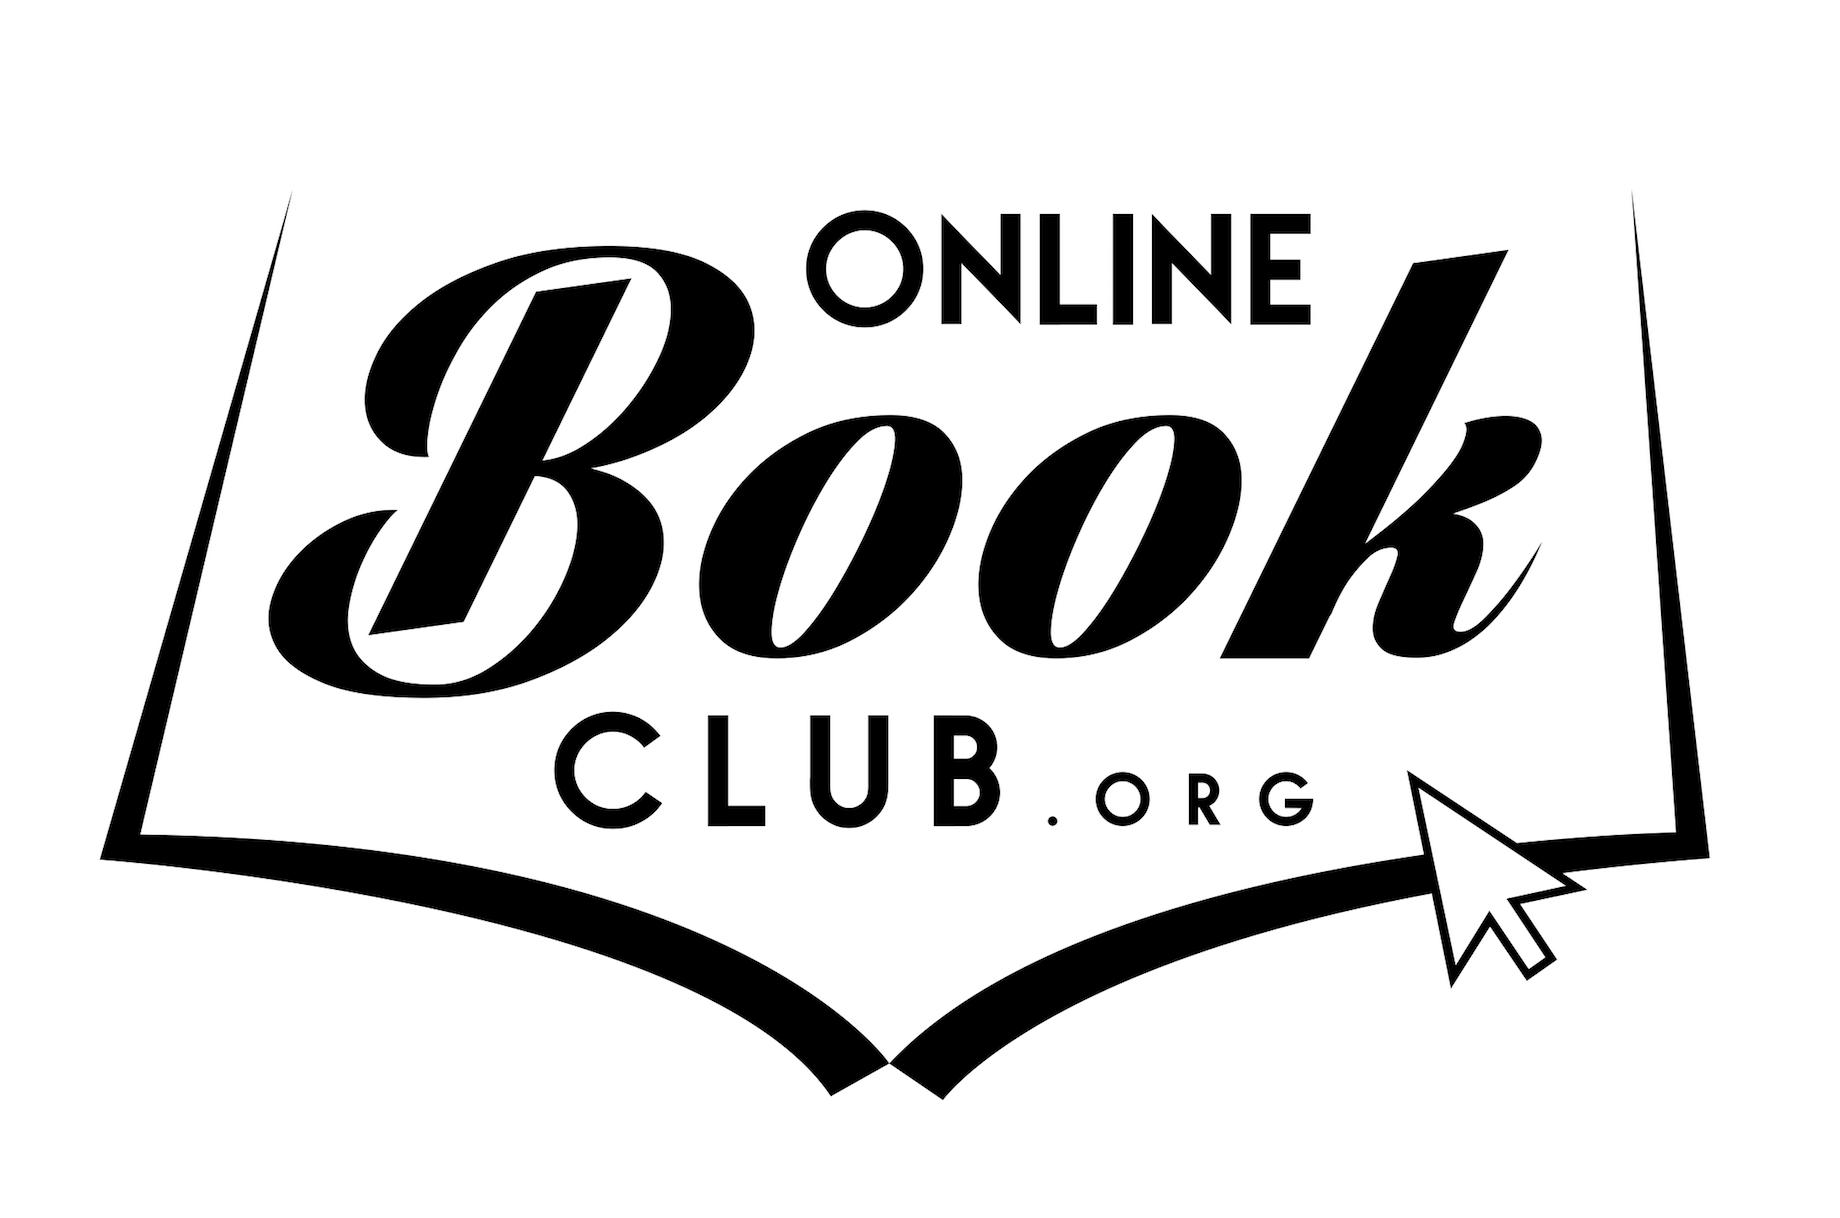 OnlineBookClub